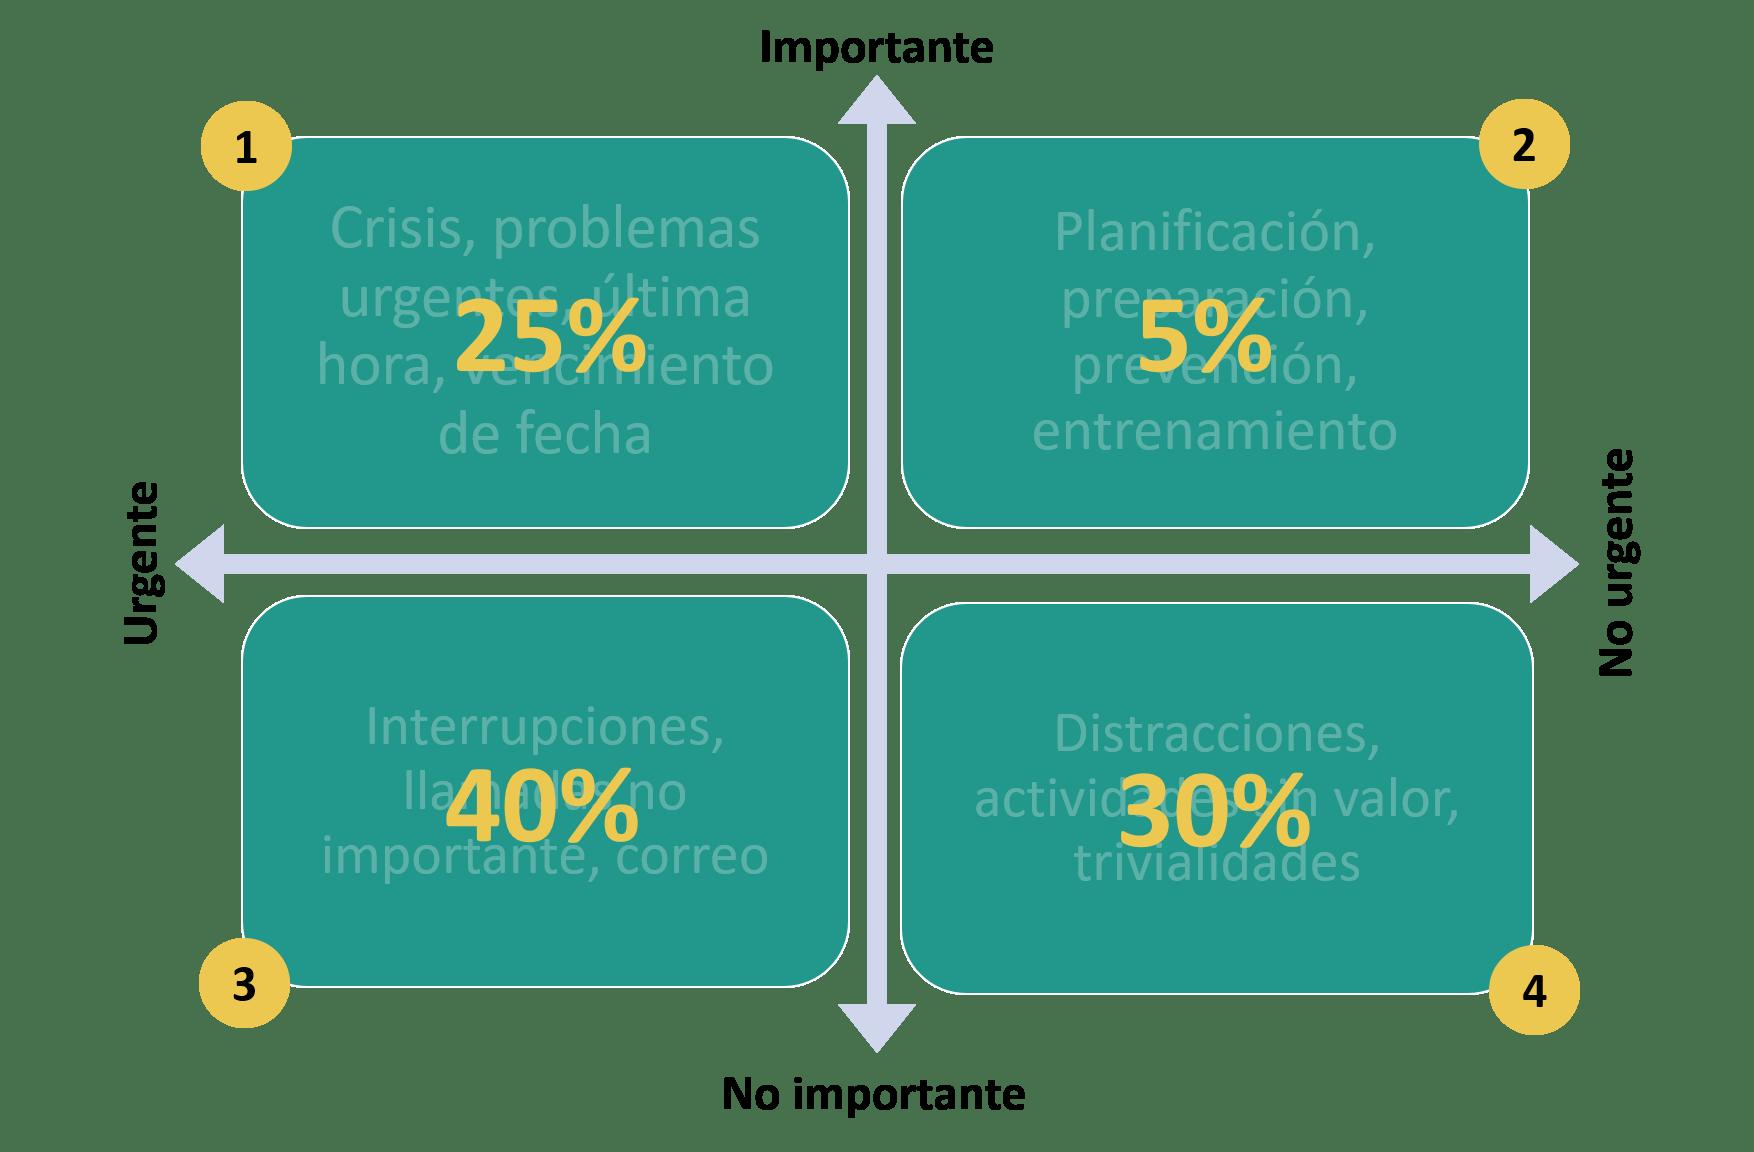 Matriz de Covey importancia urgencia desequilibrada